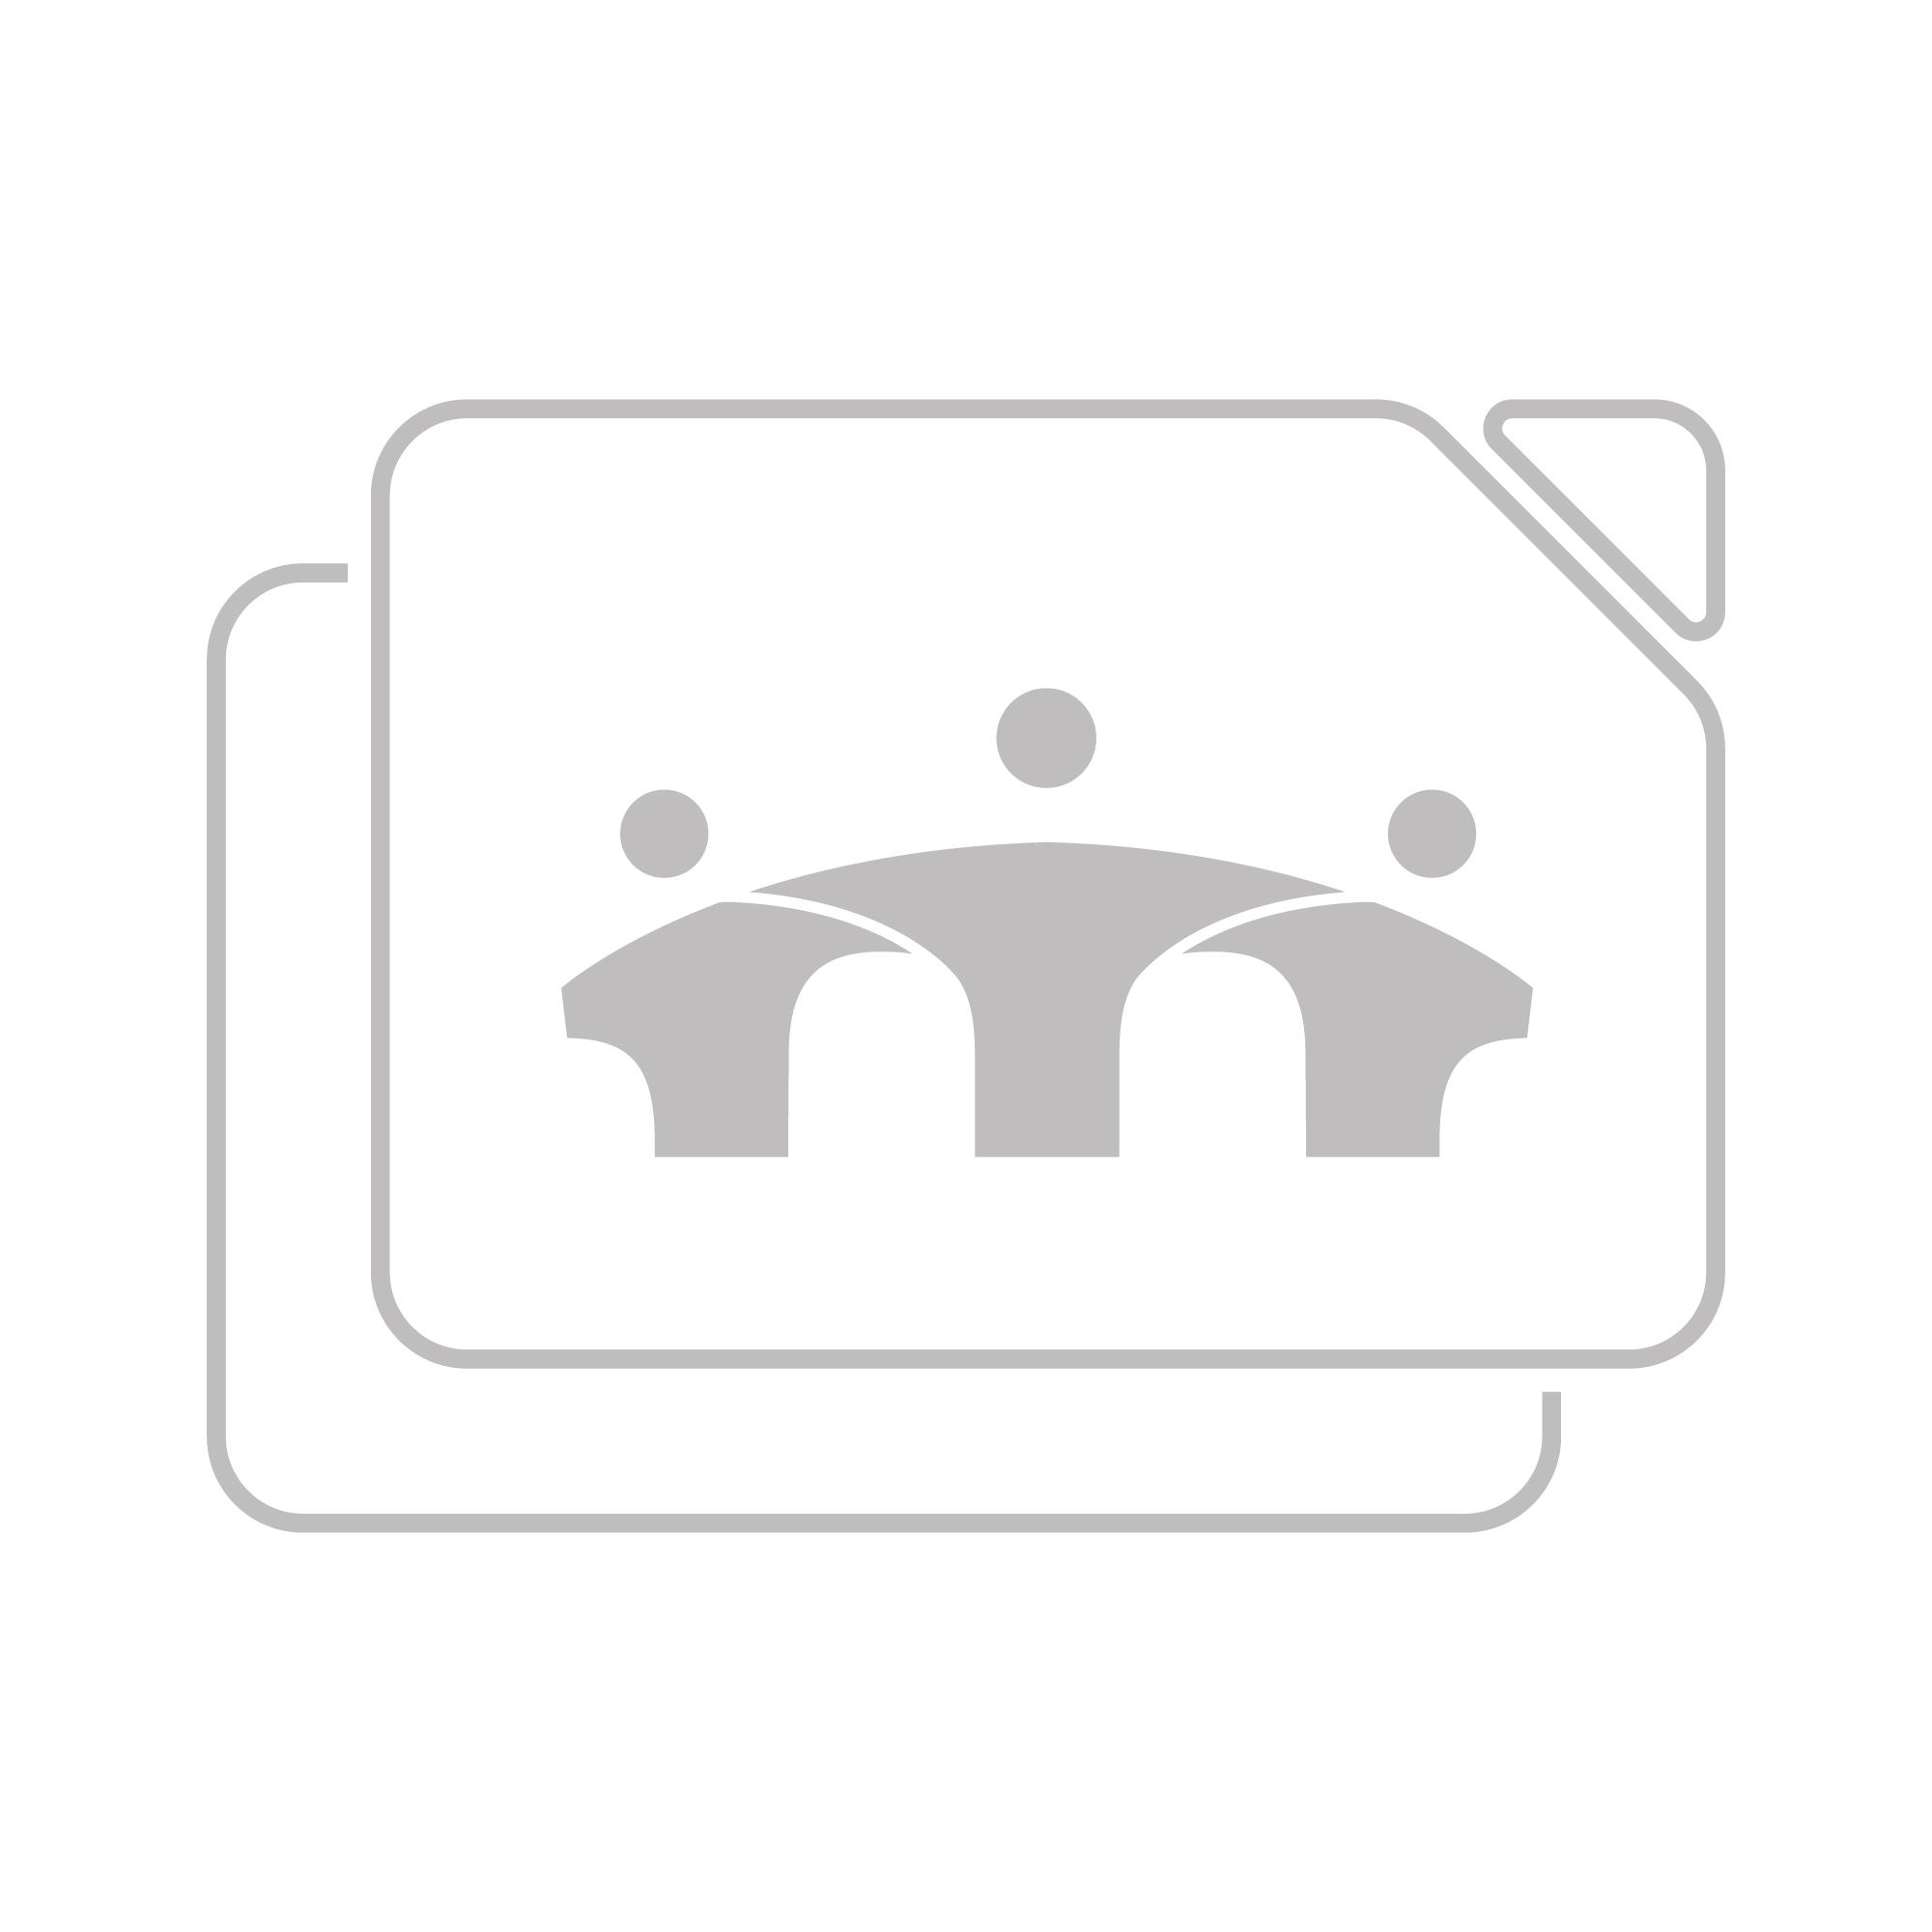 Seagate FireCuda 530 NVMe SSD 500GB